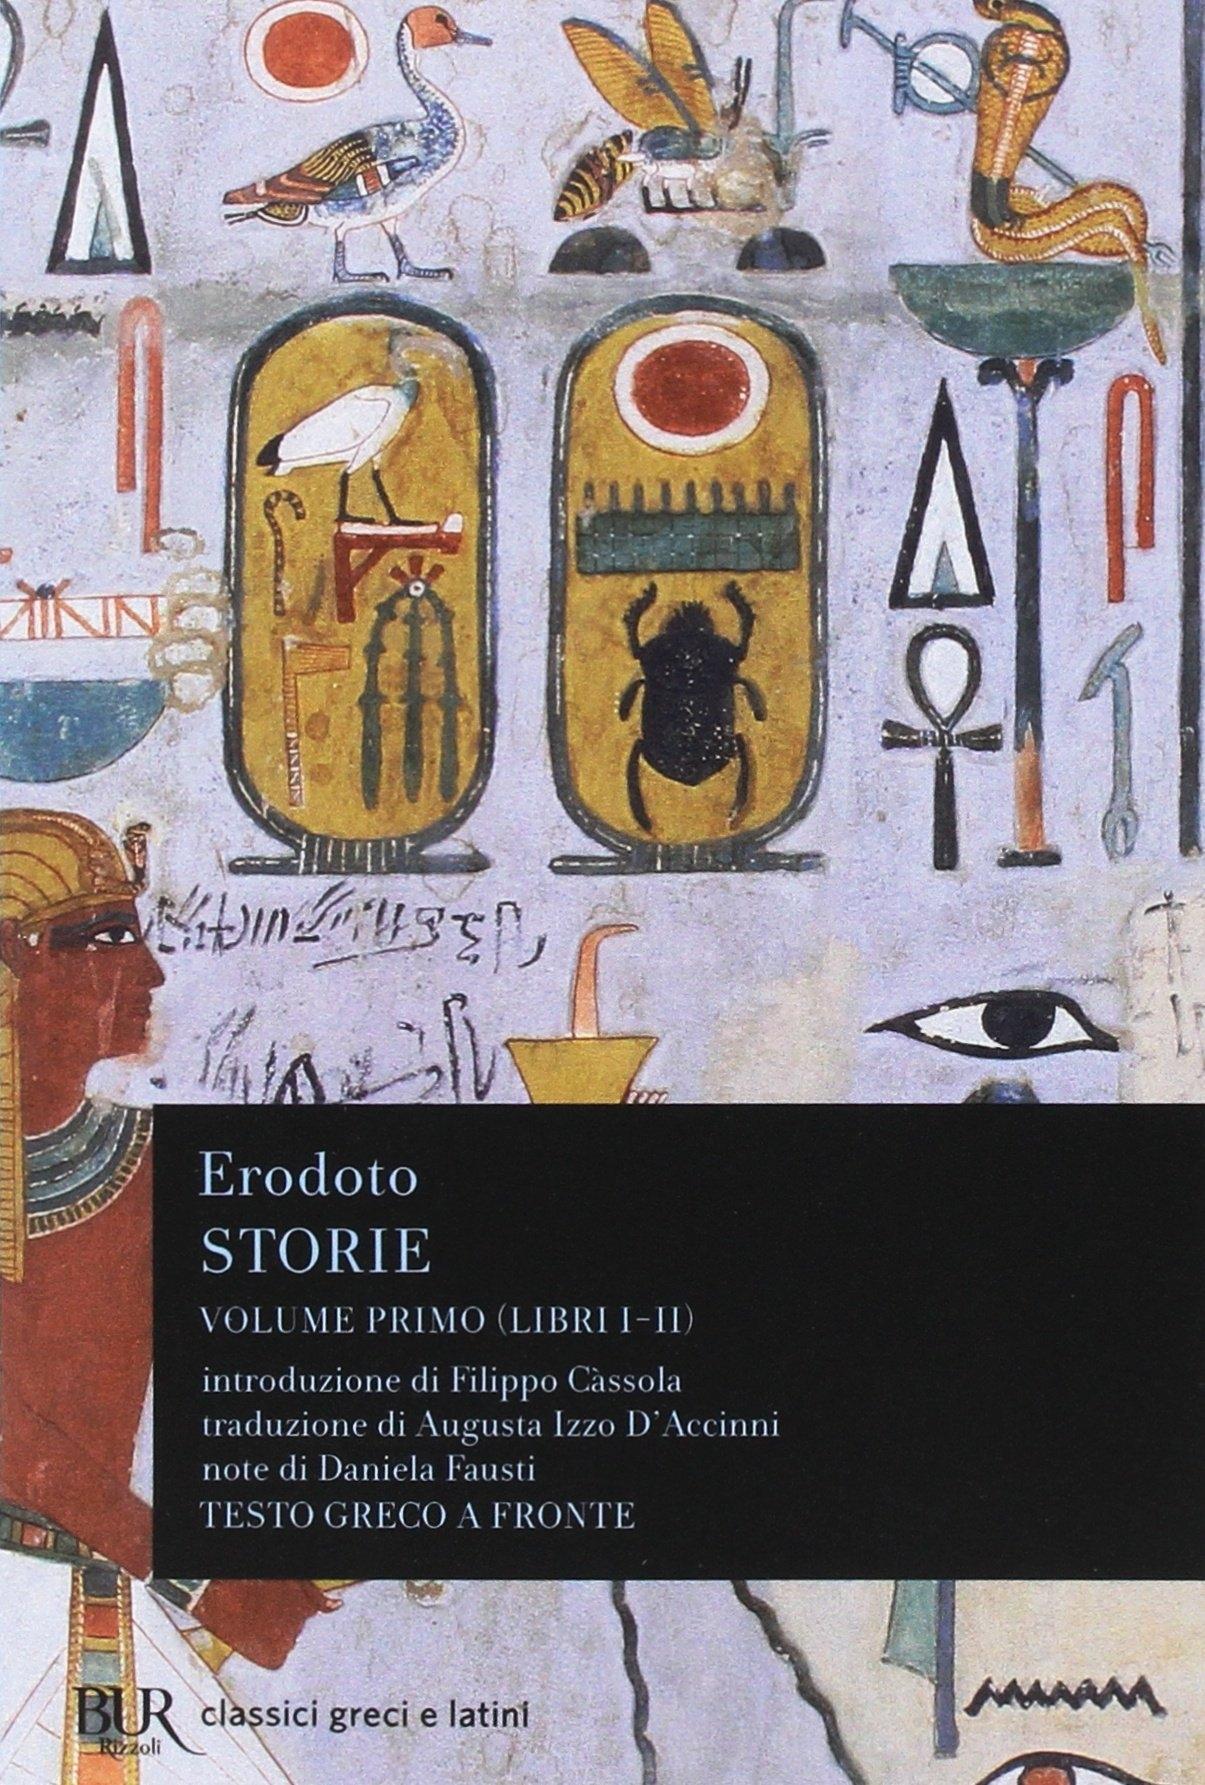 Storie. [Edizione Bilingue]. Vol. 1: Libri 1-2...